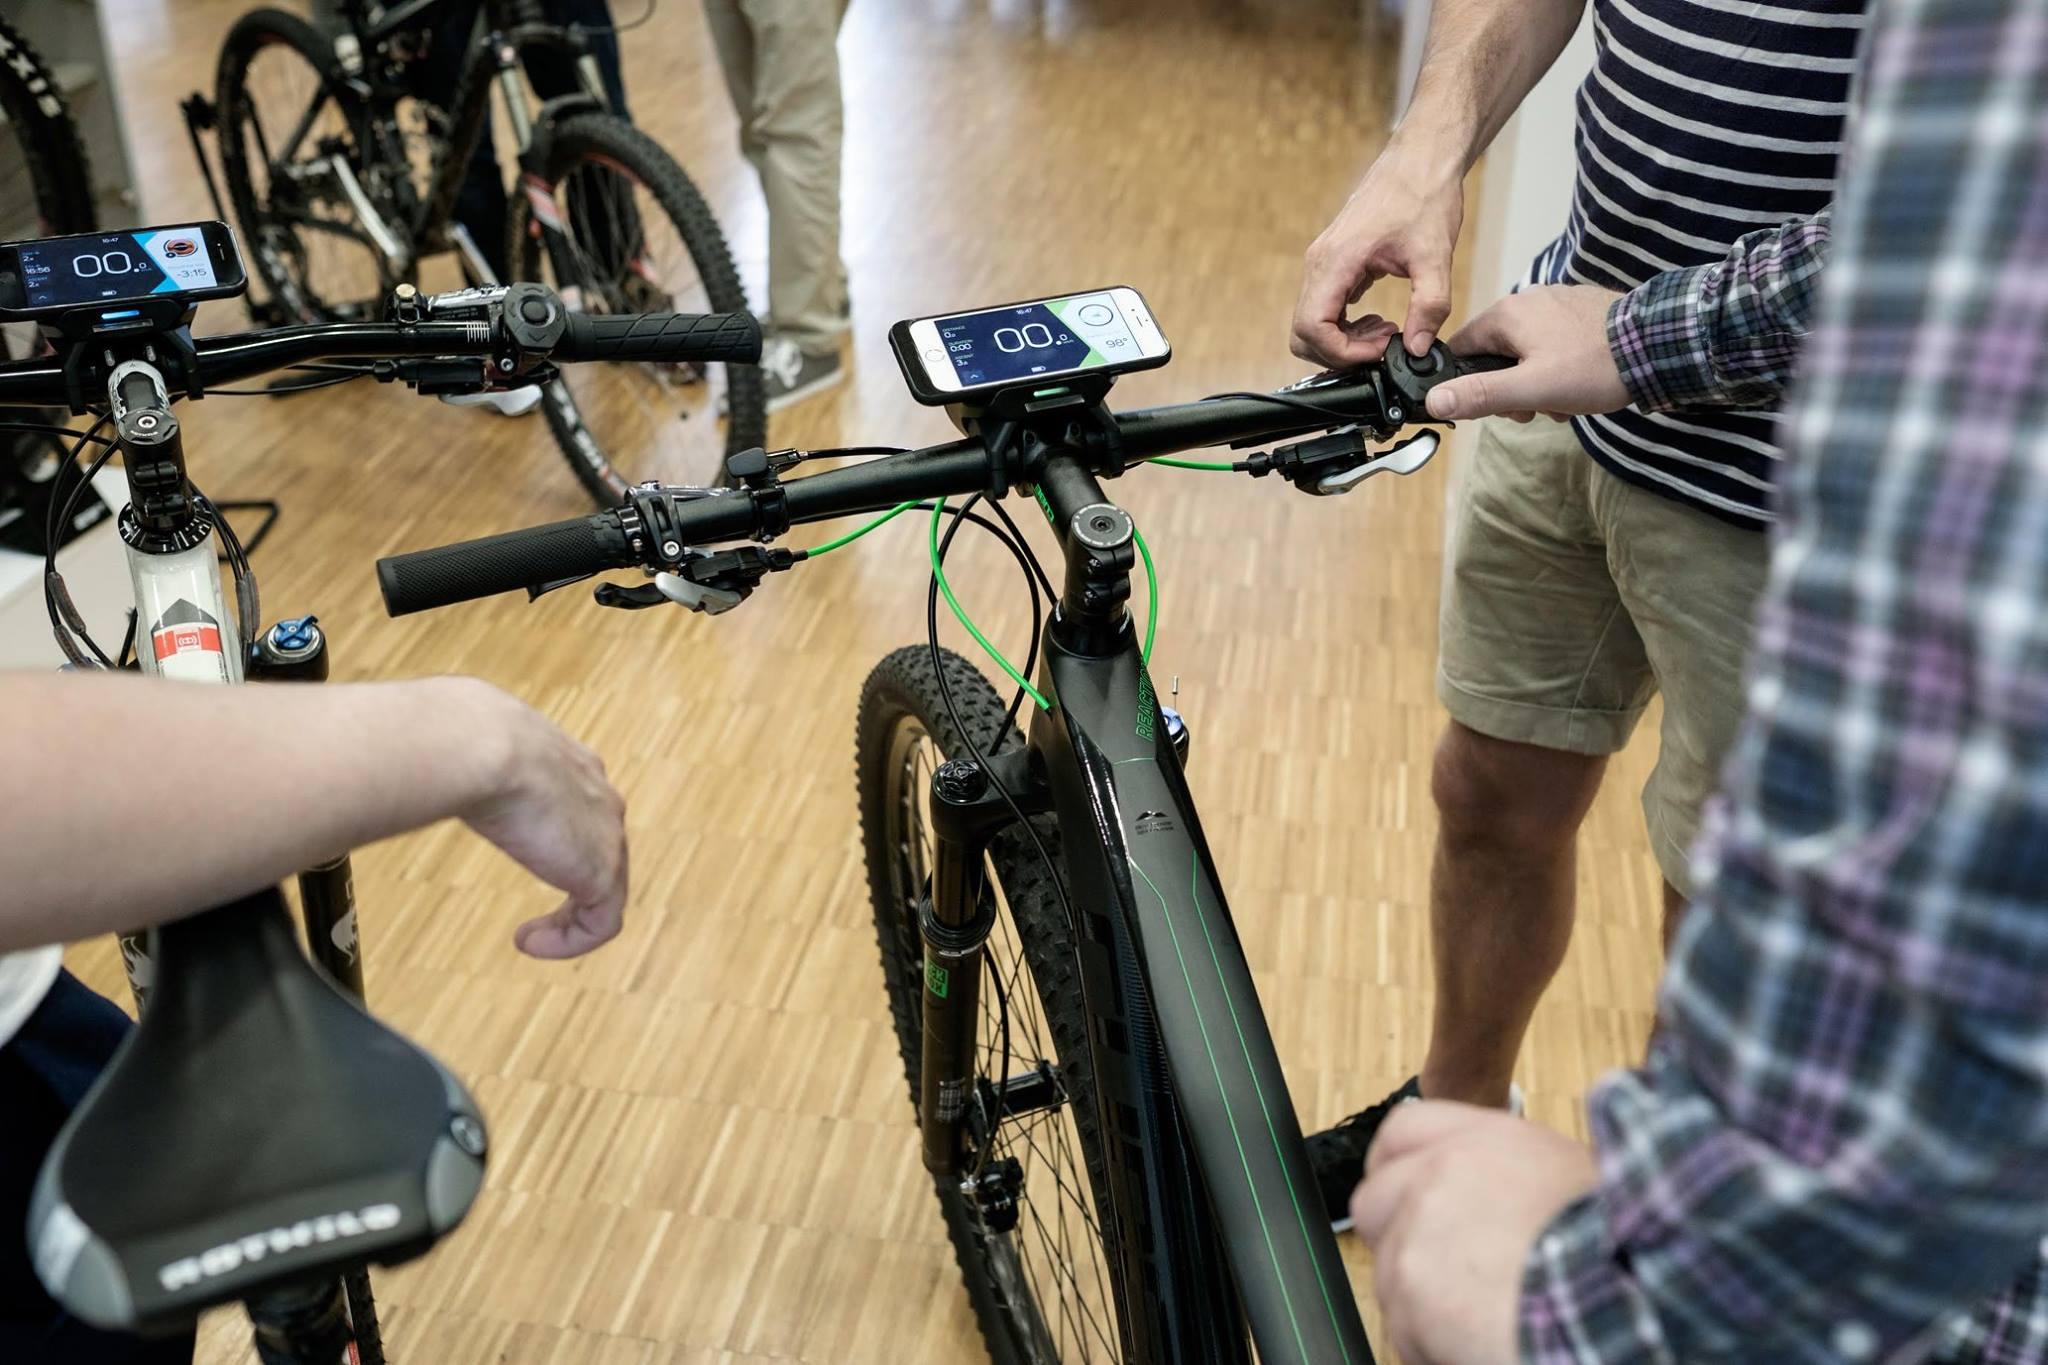 COBI – Smart Connected Biking System